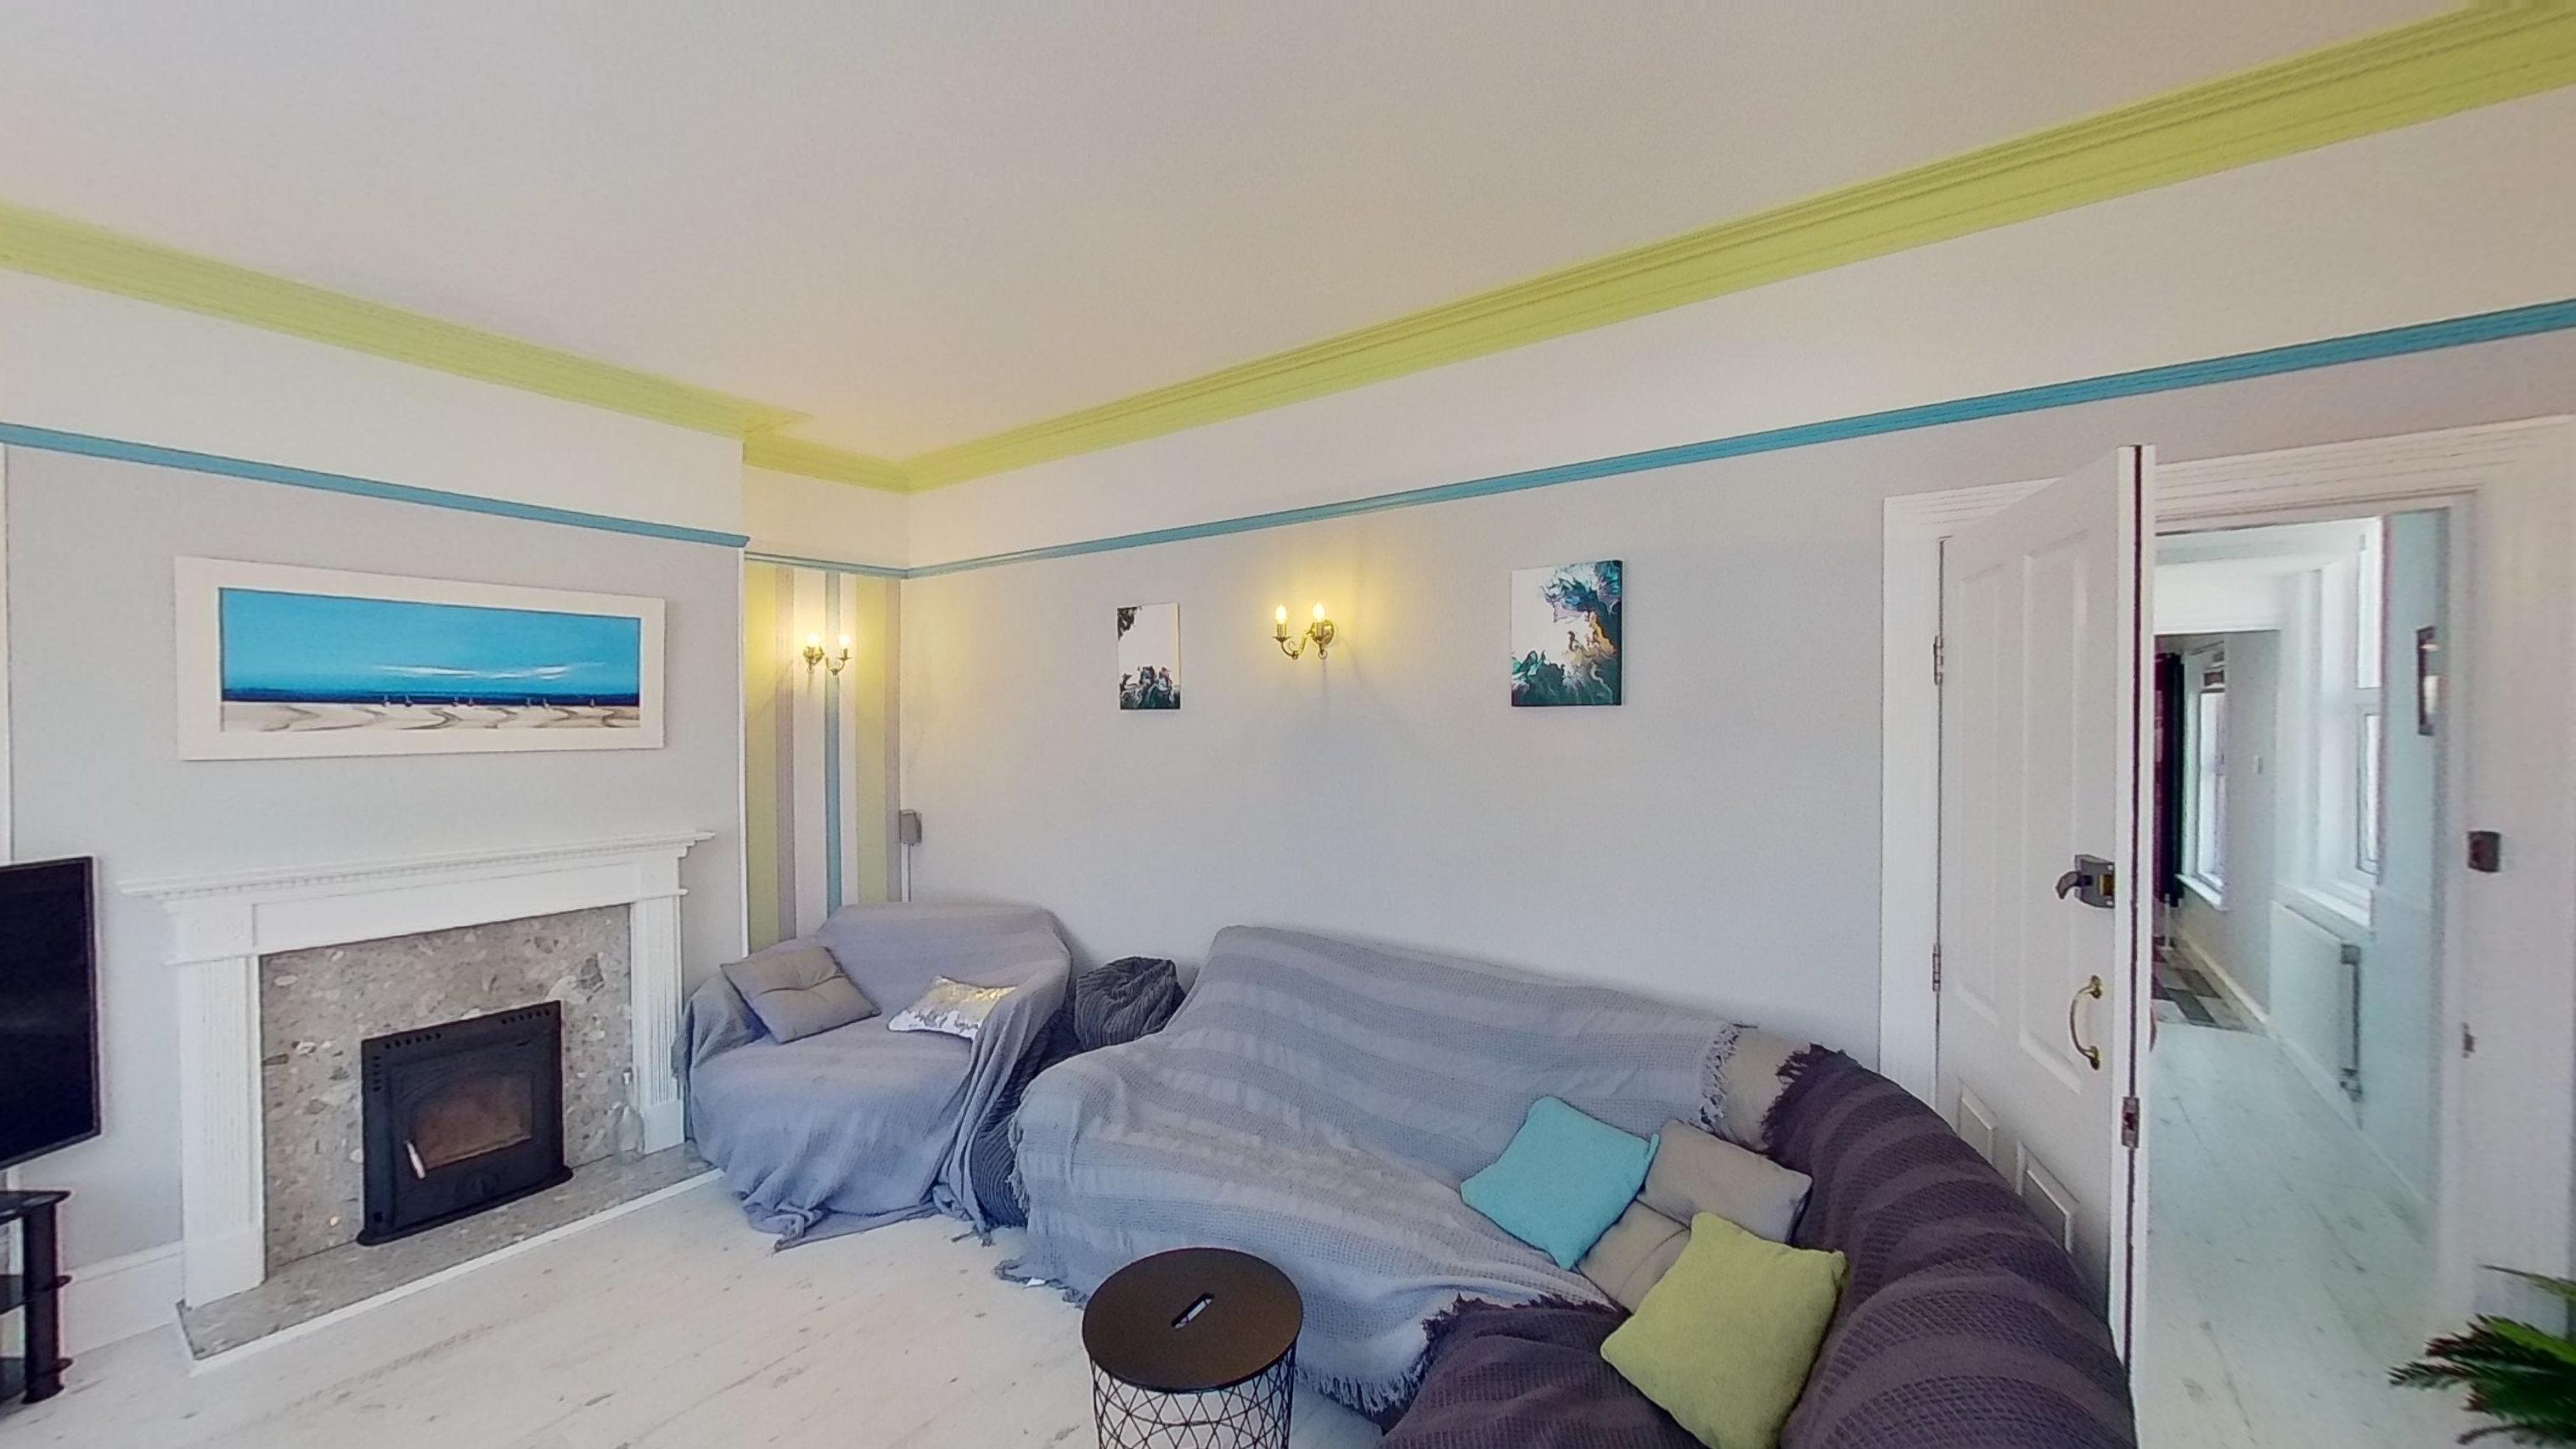 Beachcomber Holiday Lodge 07192021 051546